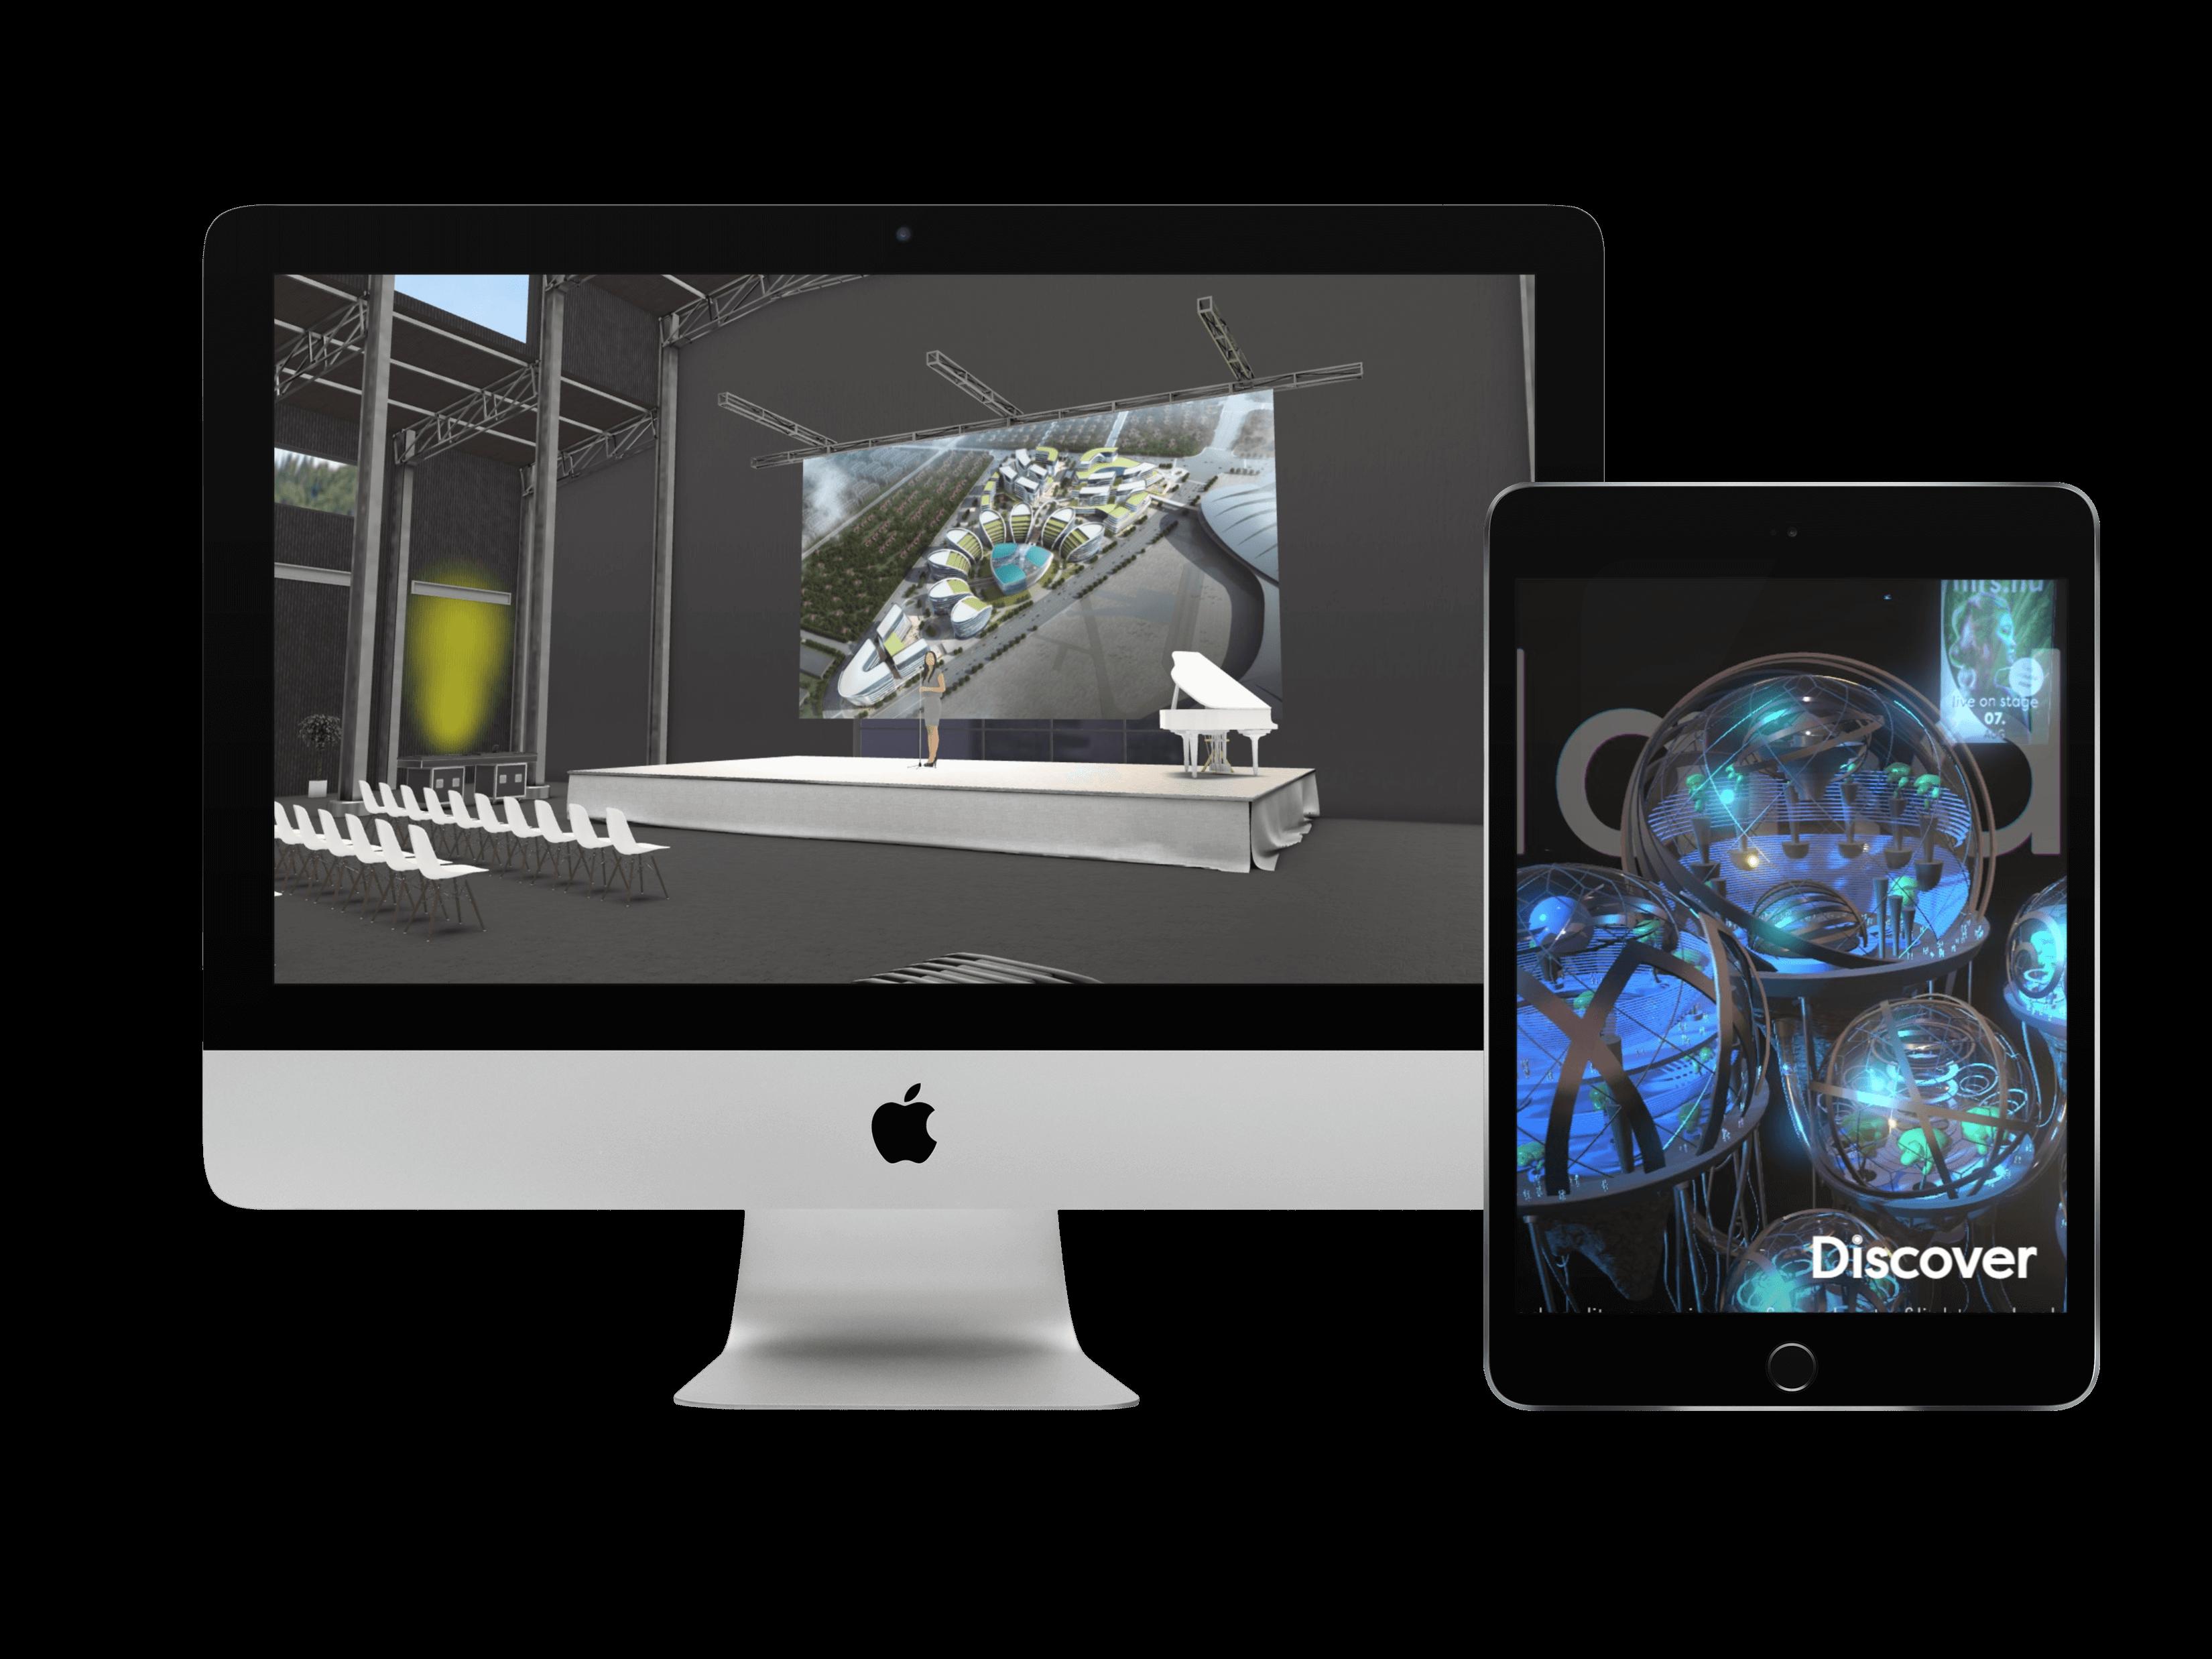 EventCloud platform virtual concert desktop & tablet